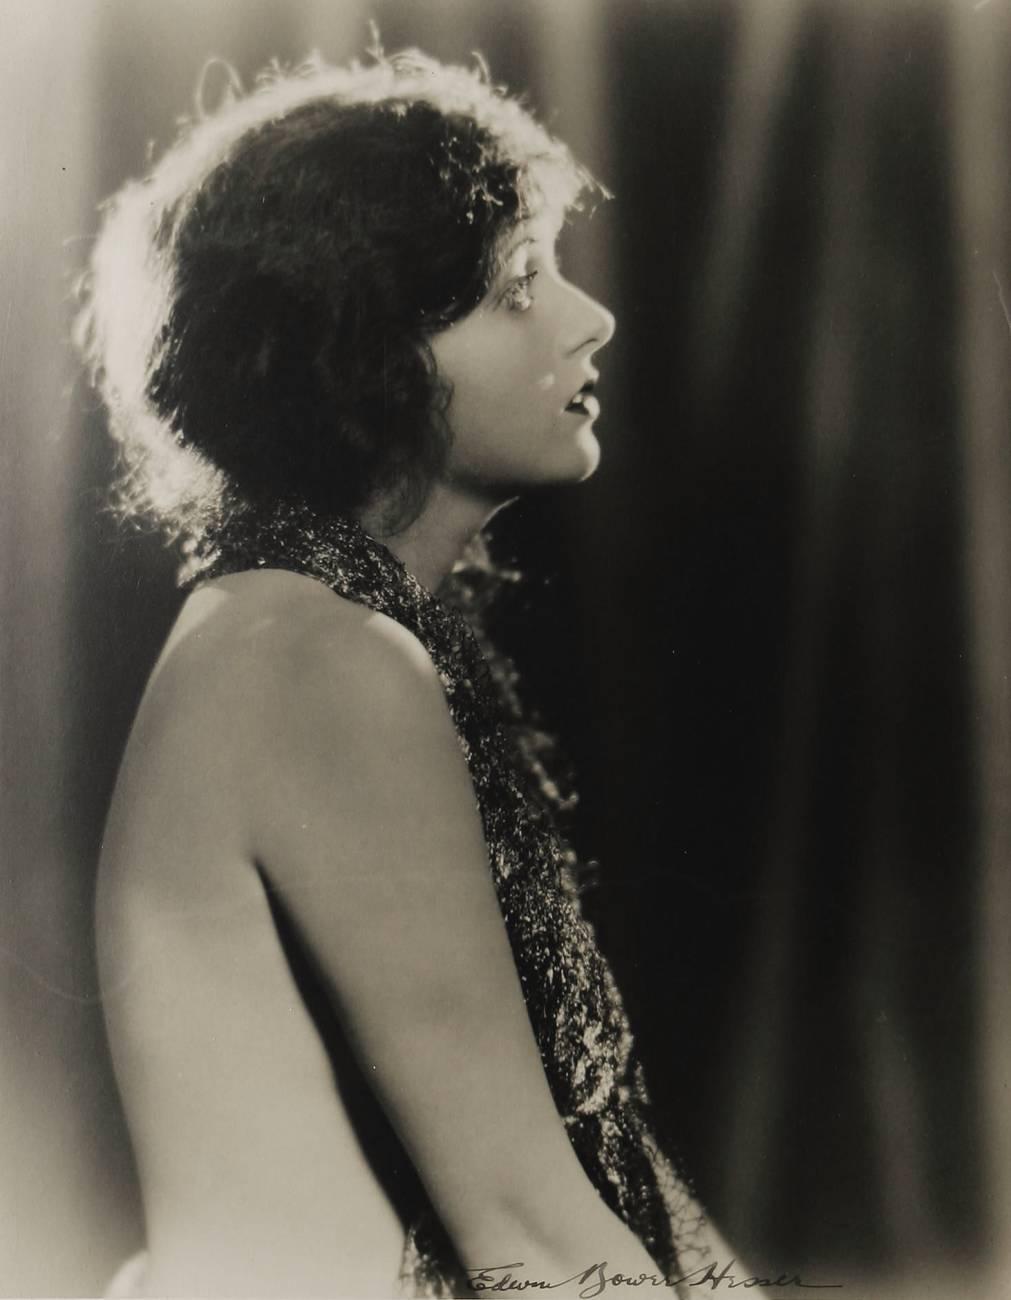 Edward Bower Hesser Madge Bellemy, 1920s